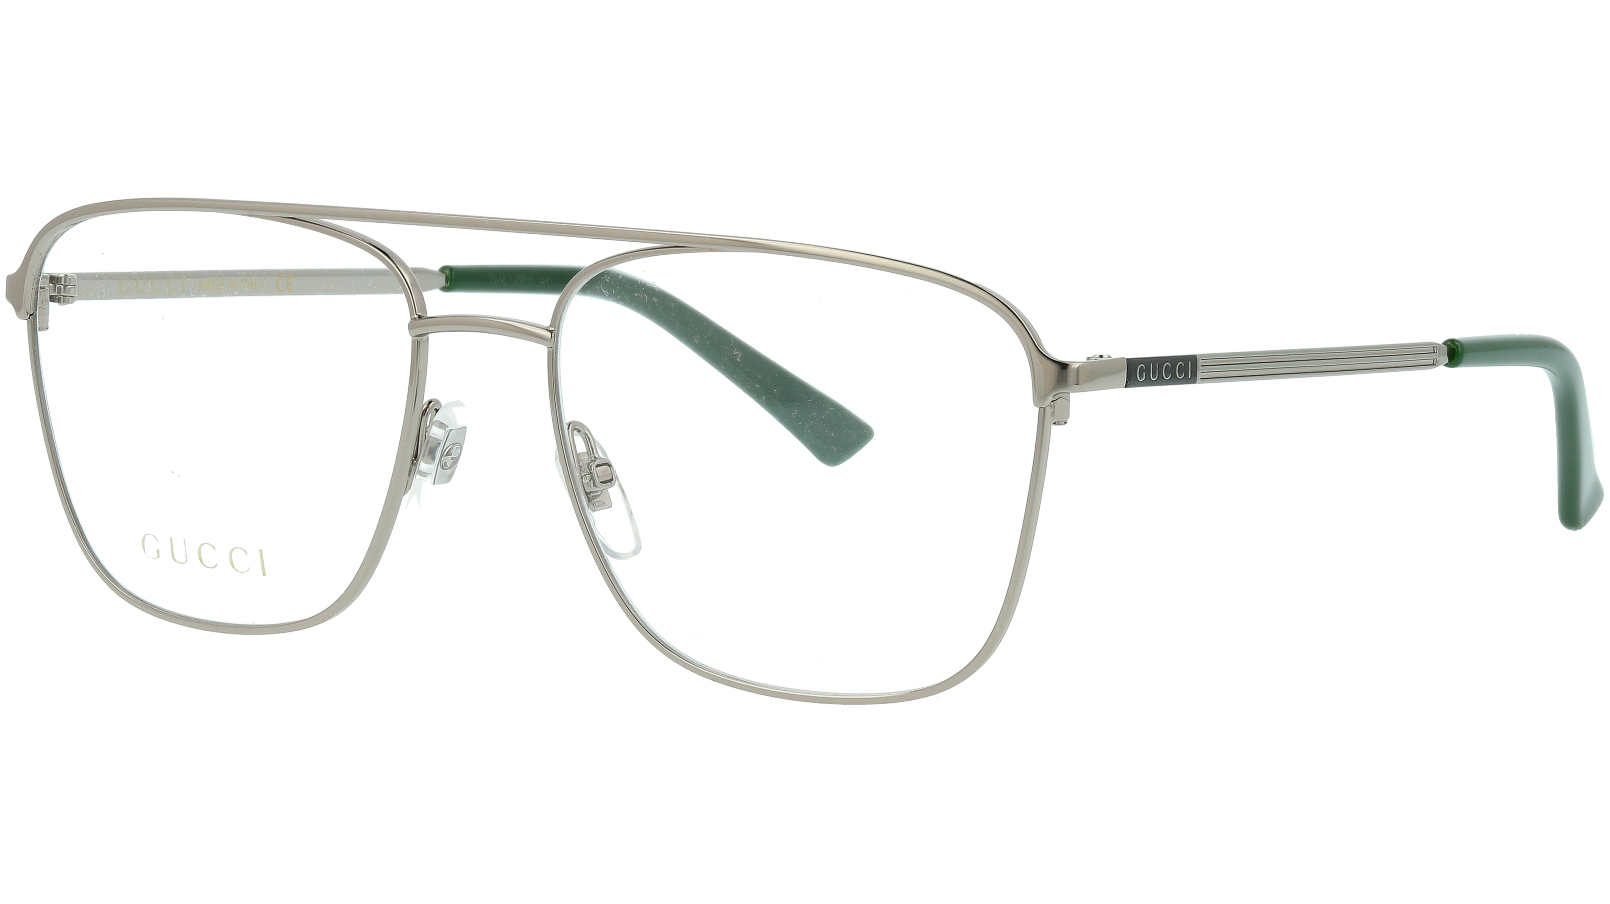 Gucci GG0833O 003 55 Ruthenium Pilot Glasses